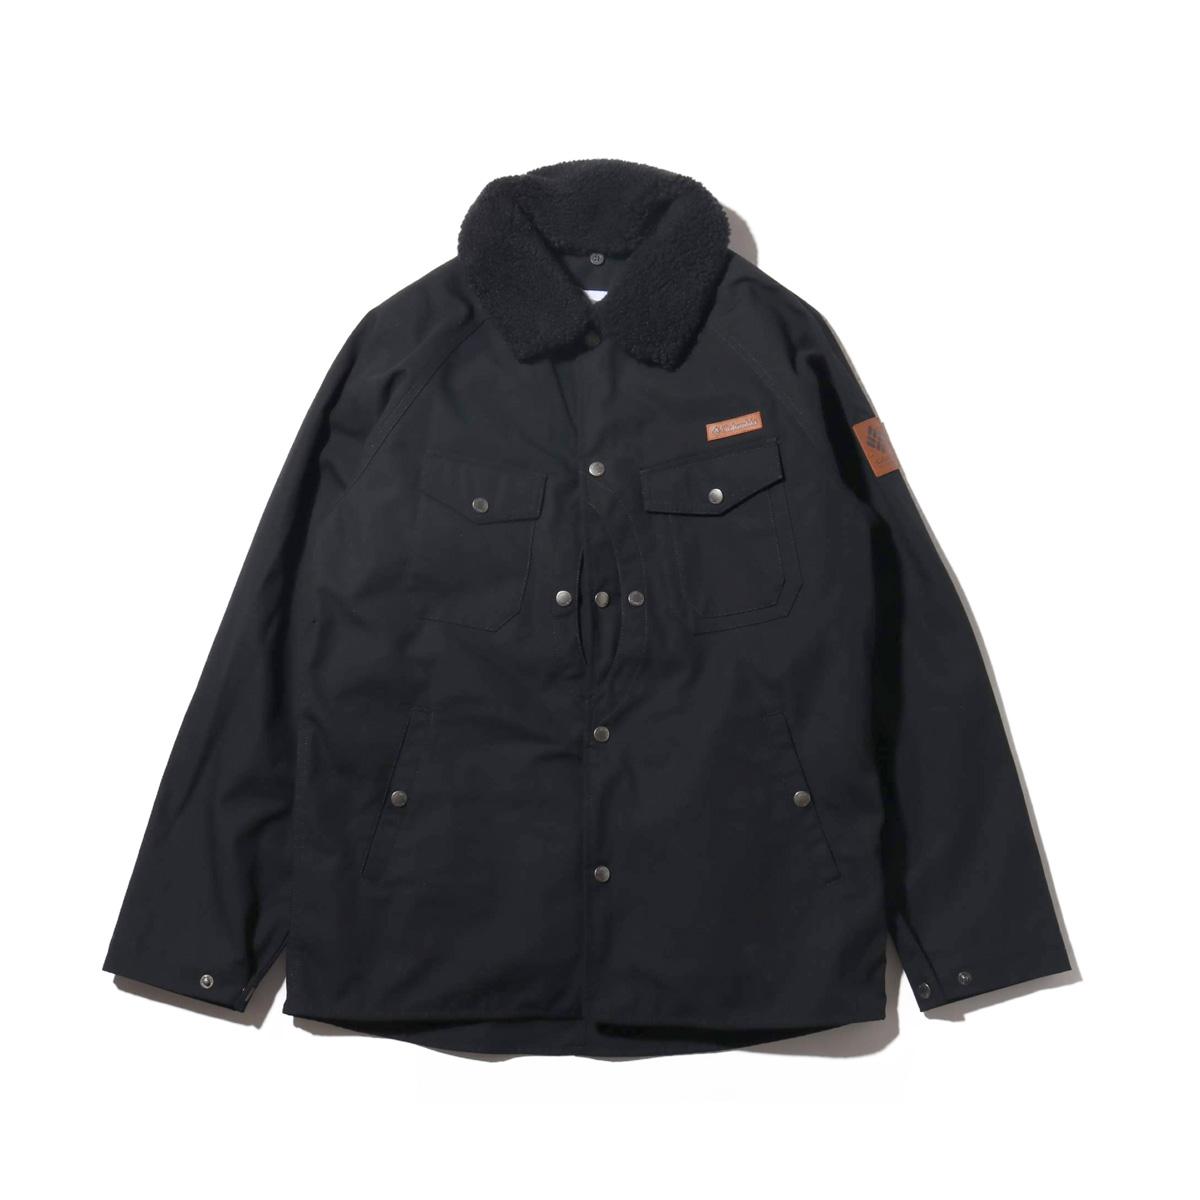 Columbia TENT TRAIL JACK (コロンビア テントトレイル ジャケット)BLACK【メンズ ジャケット】18FW-I